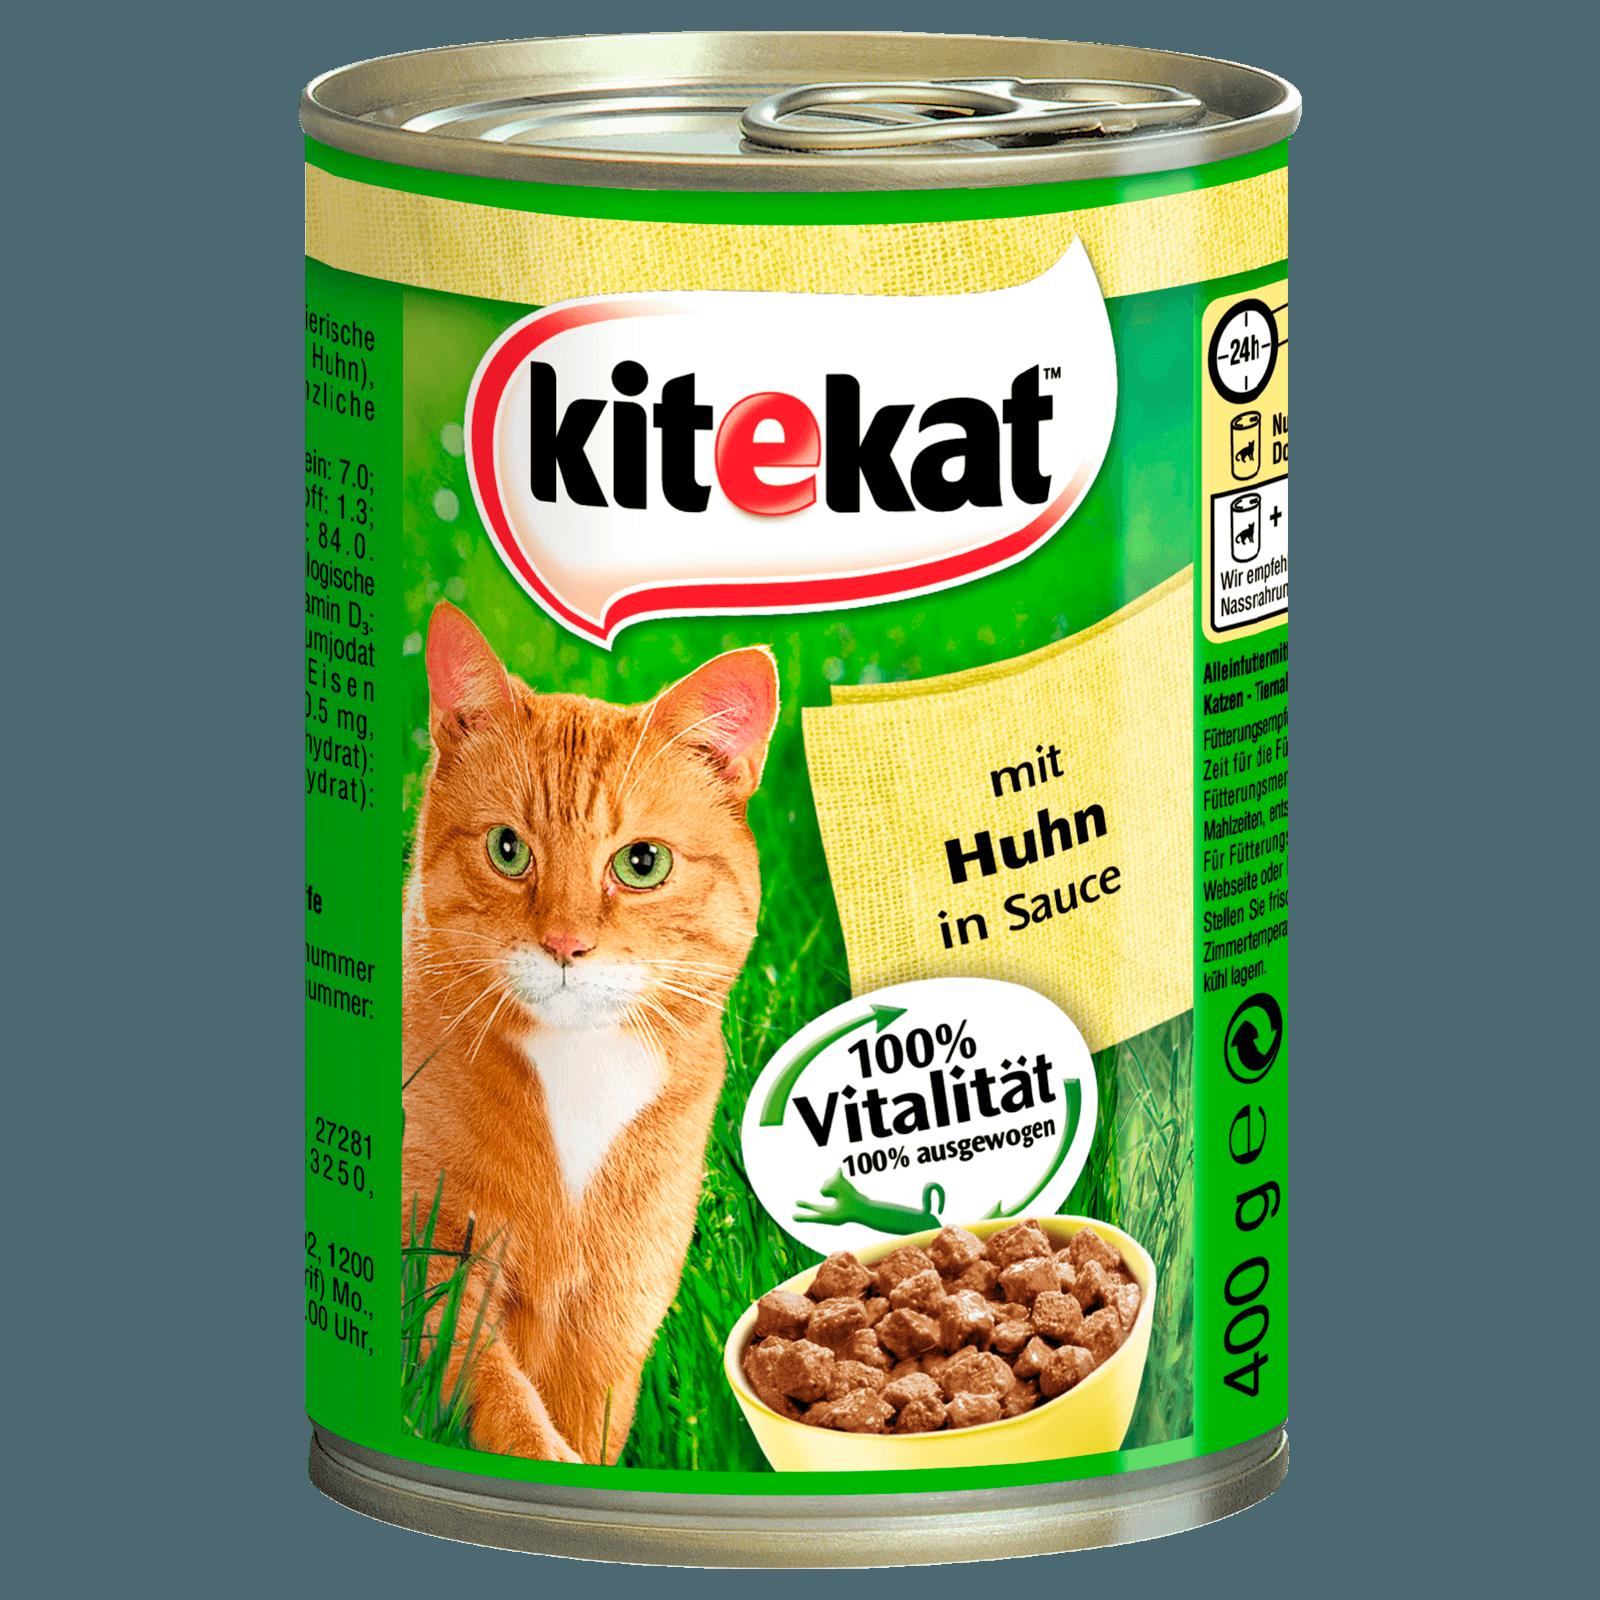 Kitekat Katzenfutter Mit Huhn in Soße 400g